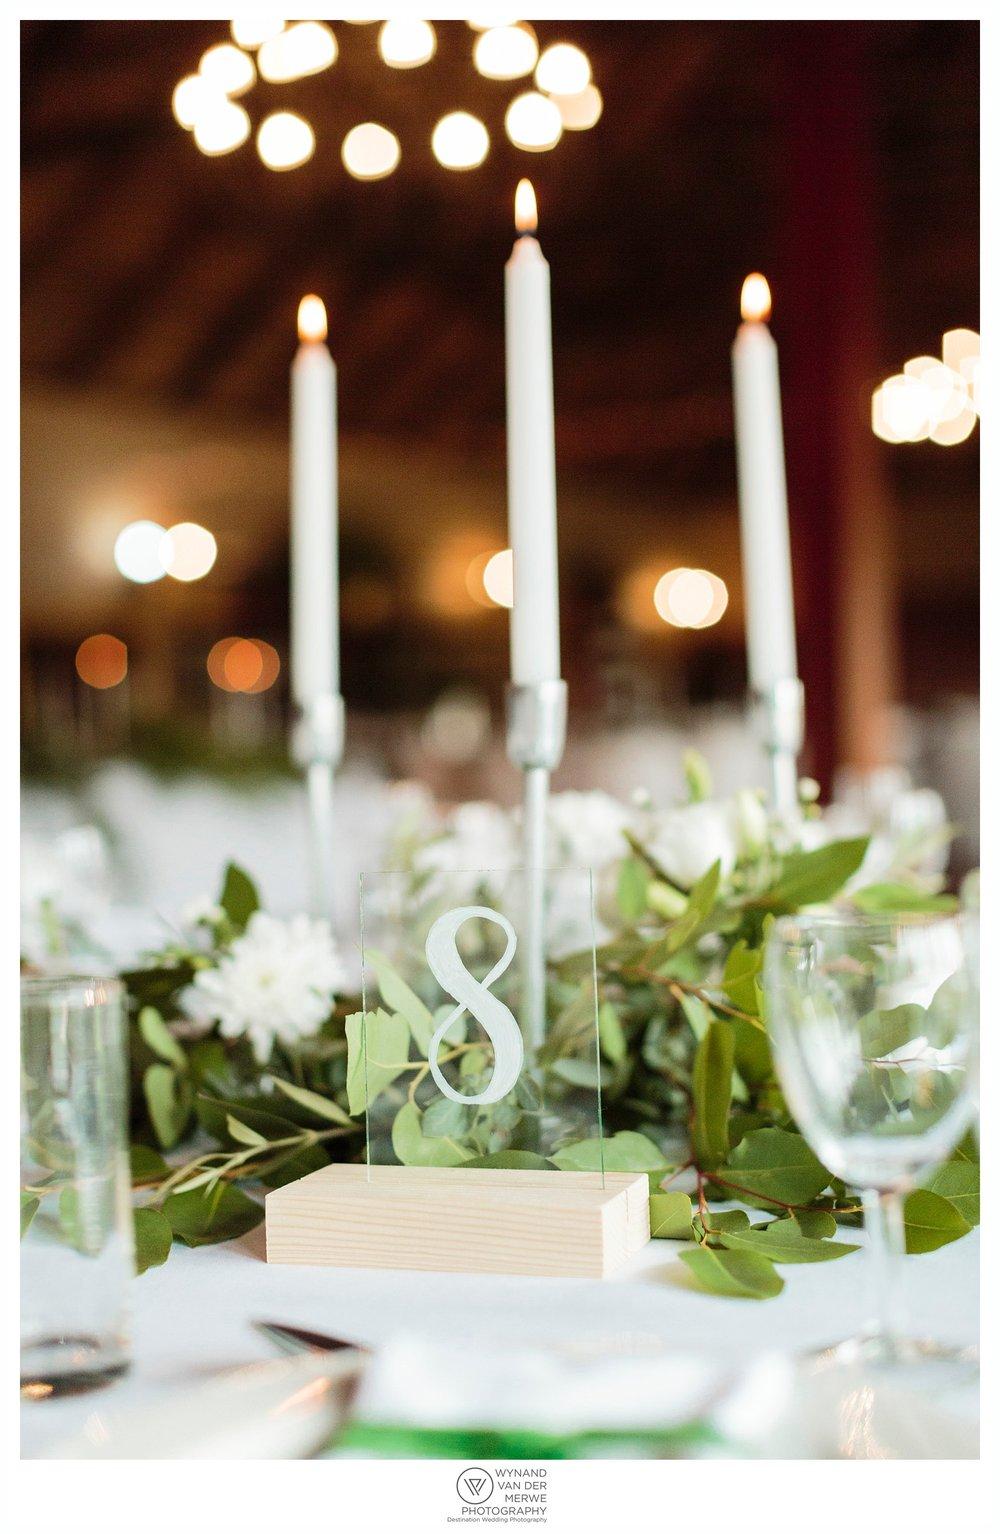 WynandvanderMerwe klaasjan mareli ingaadi spa events beautiful wedding photography gauteng southafrica-8.jpg